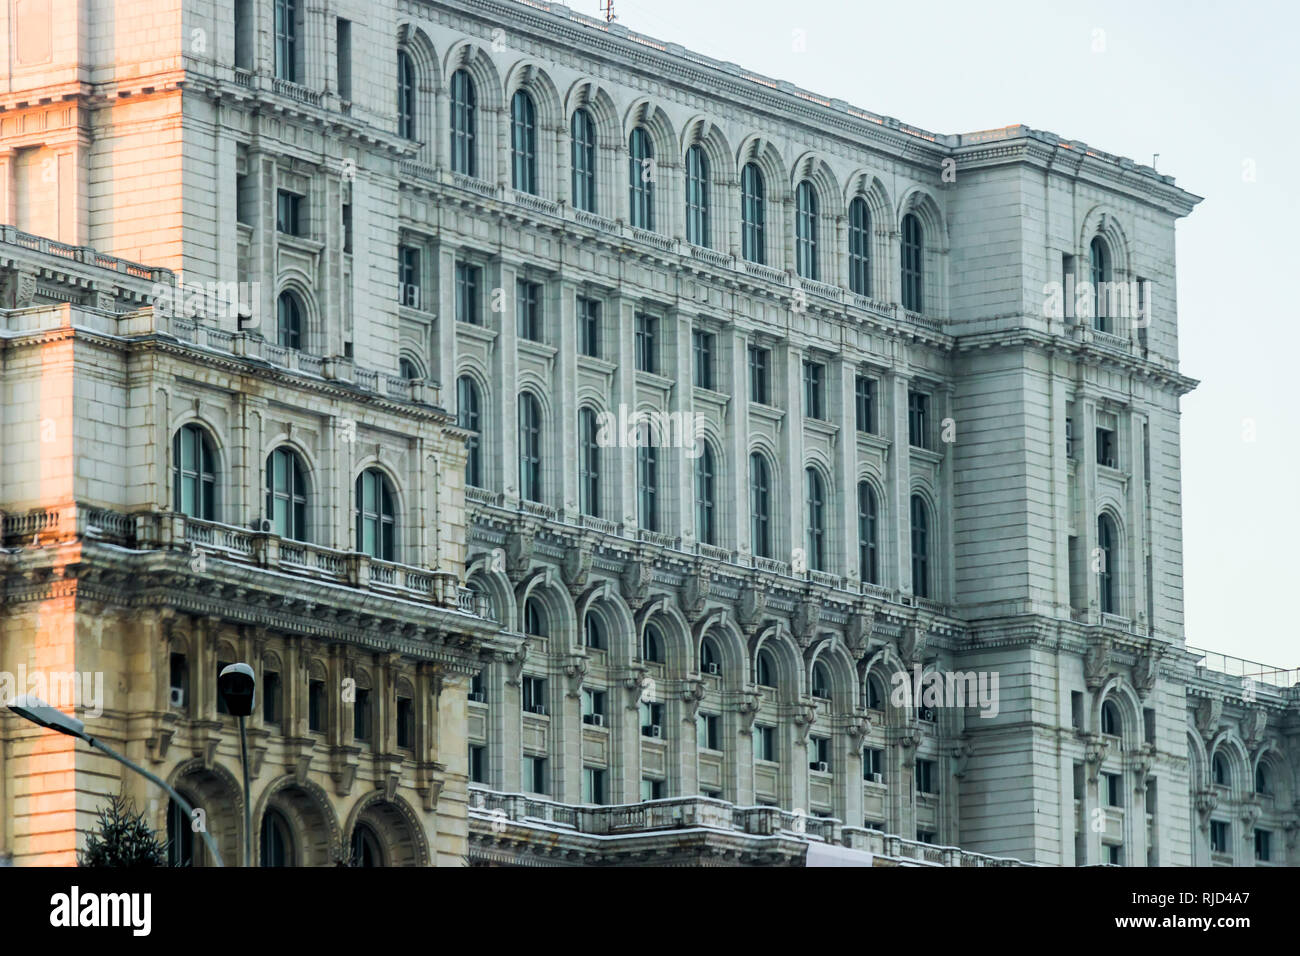 Romanian parliament palace building detail scene Stock Photo